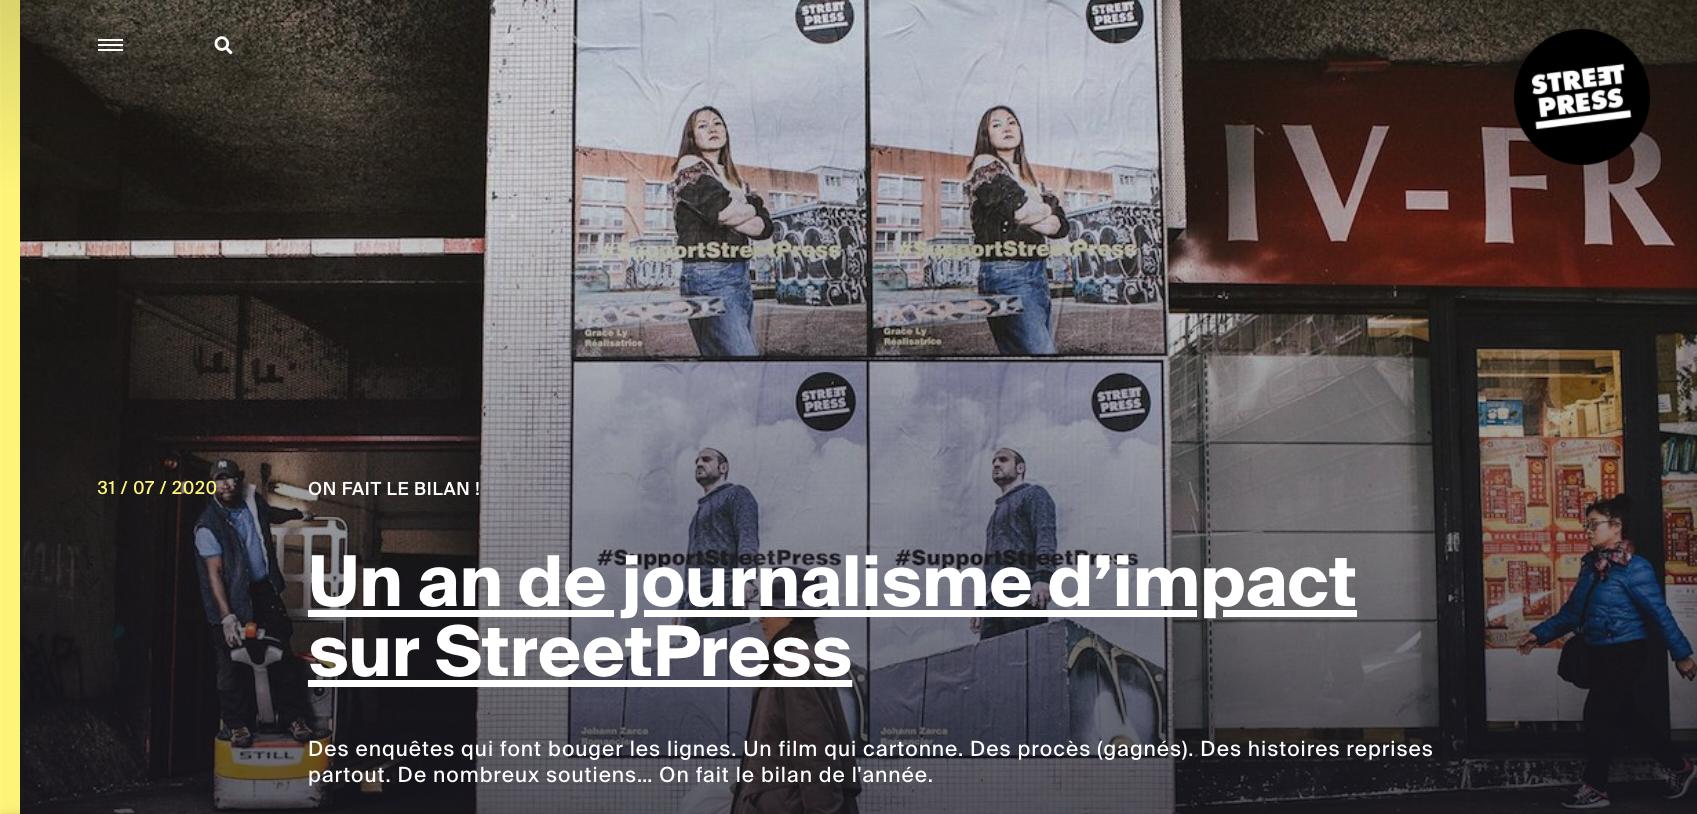 streetpress-impact